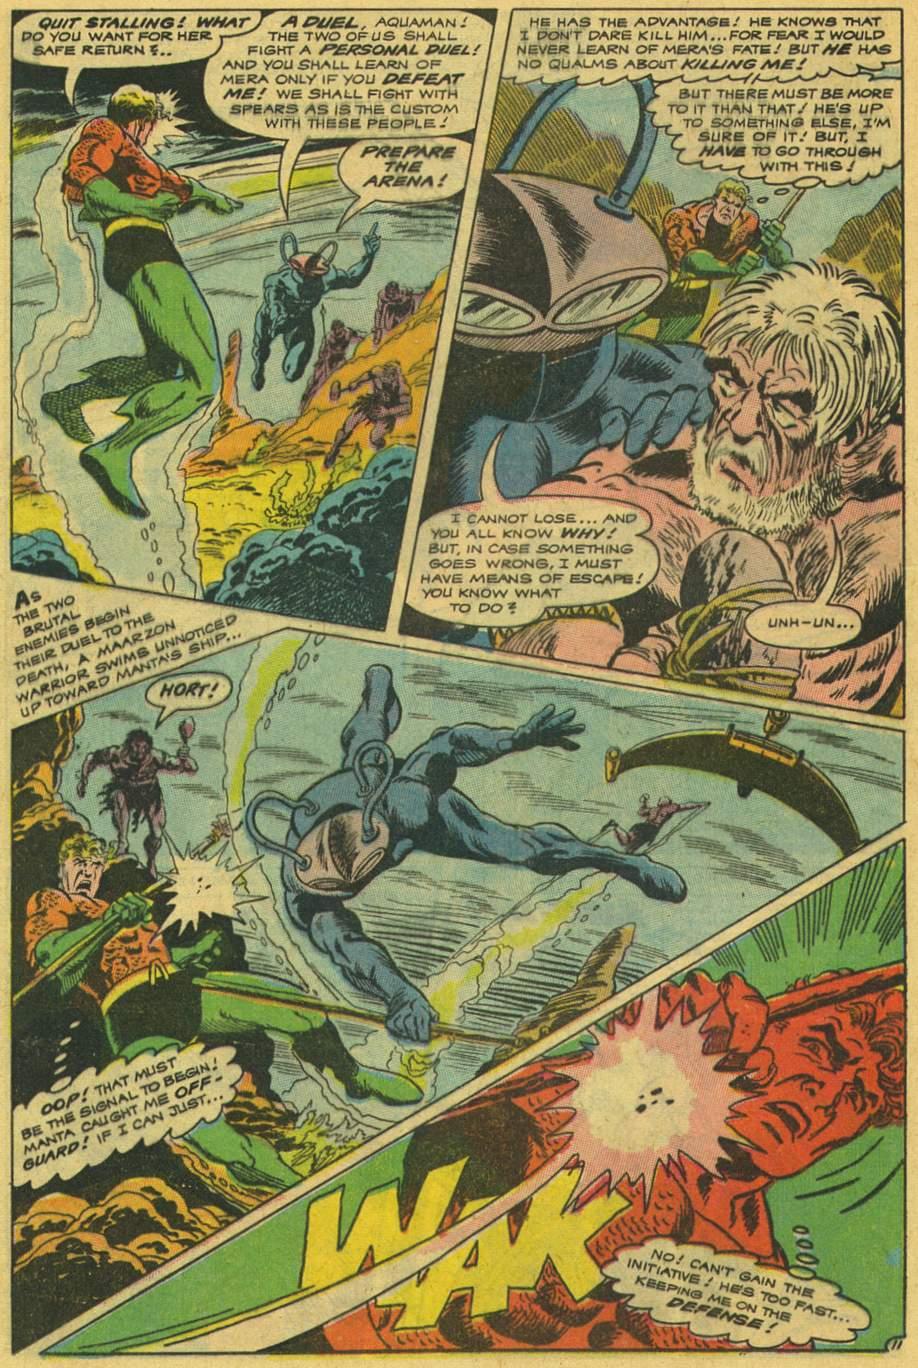 Read online Aquaman (1962) comic -  Issue #42 - 16